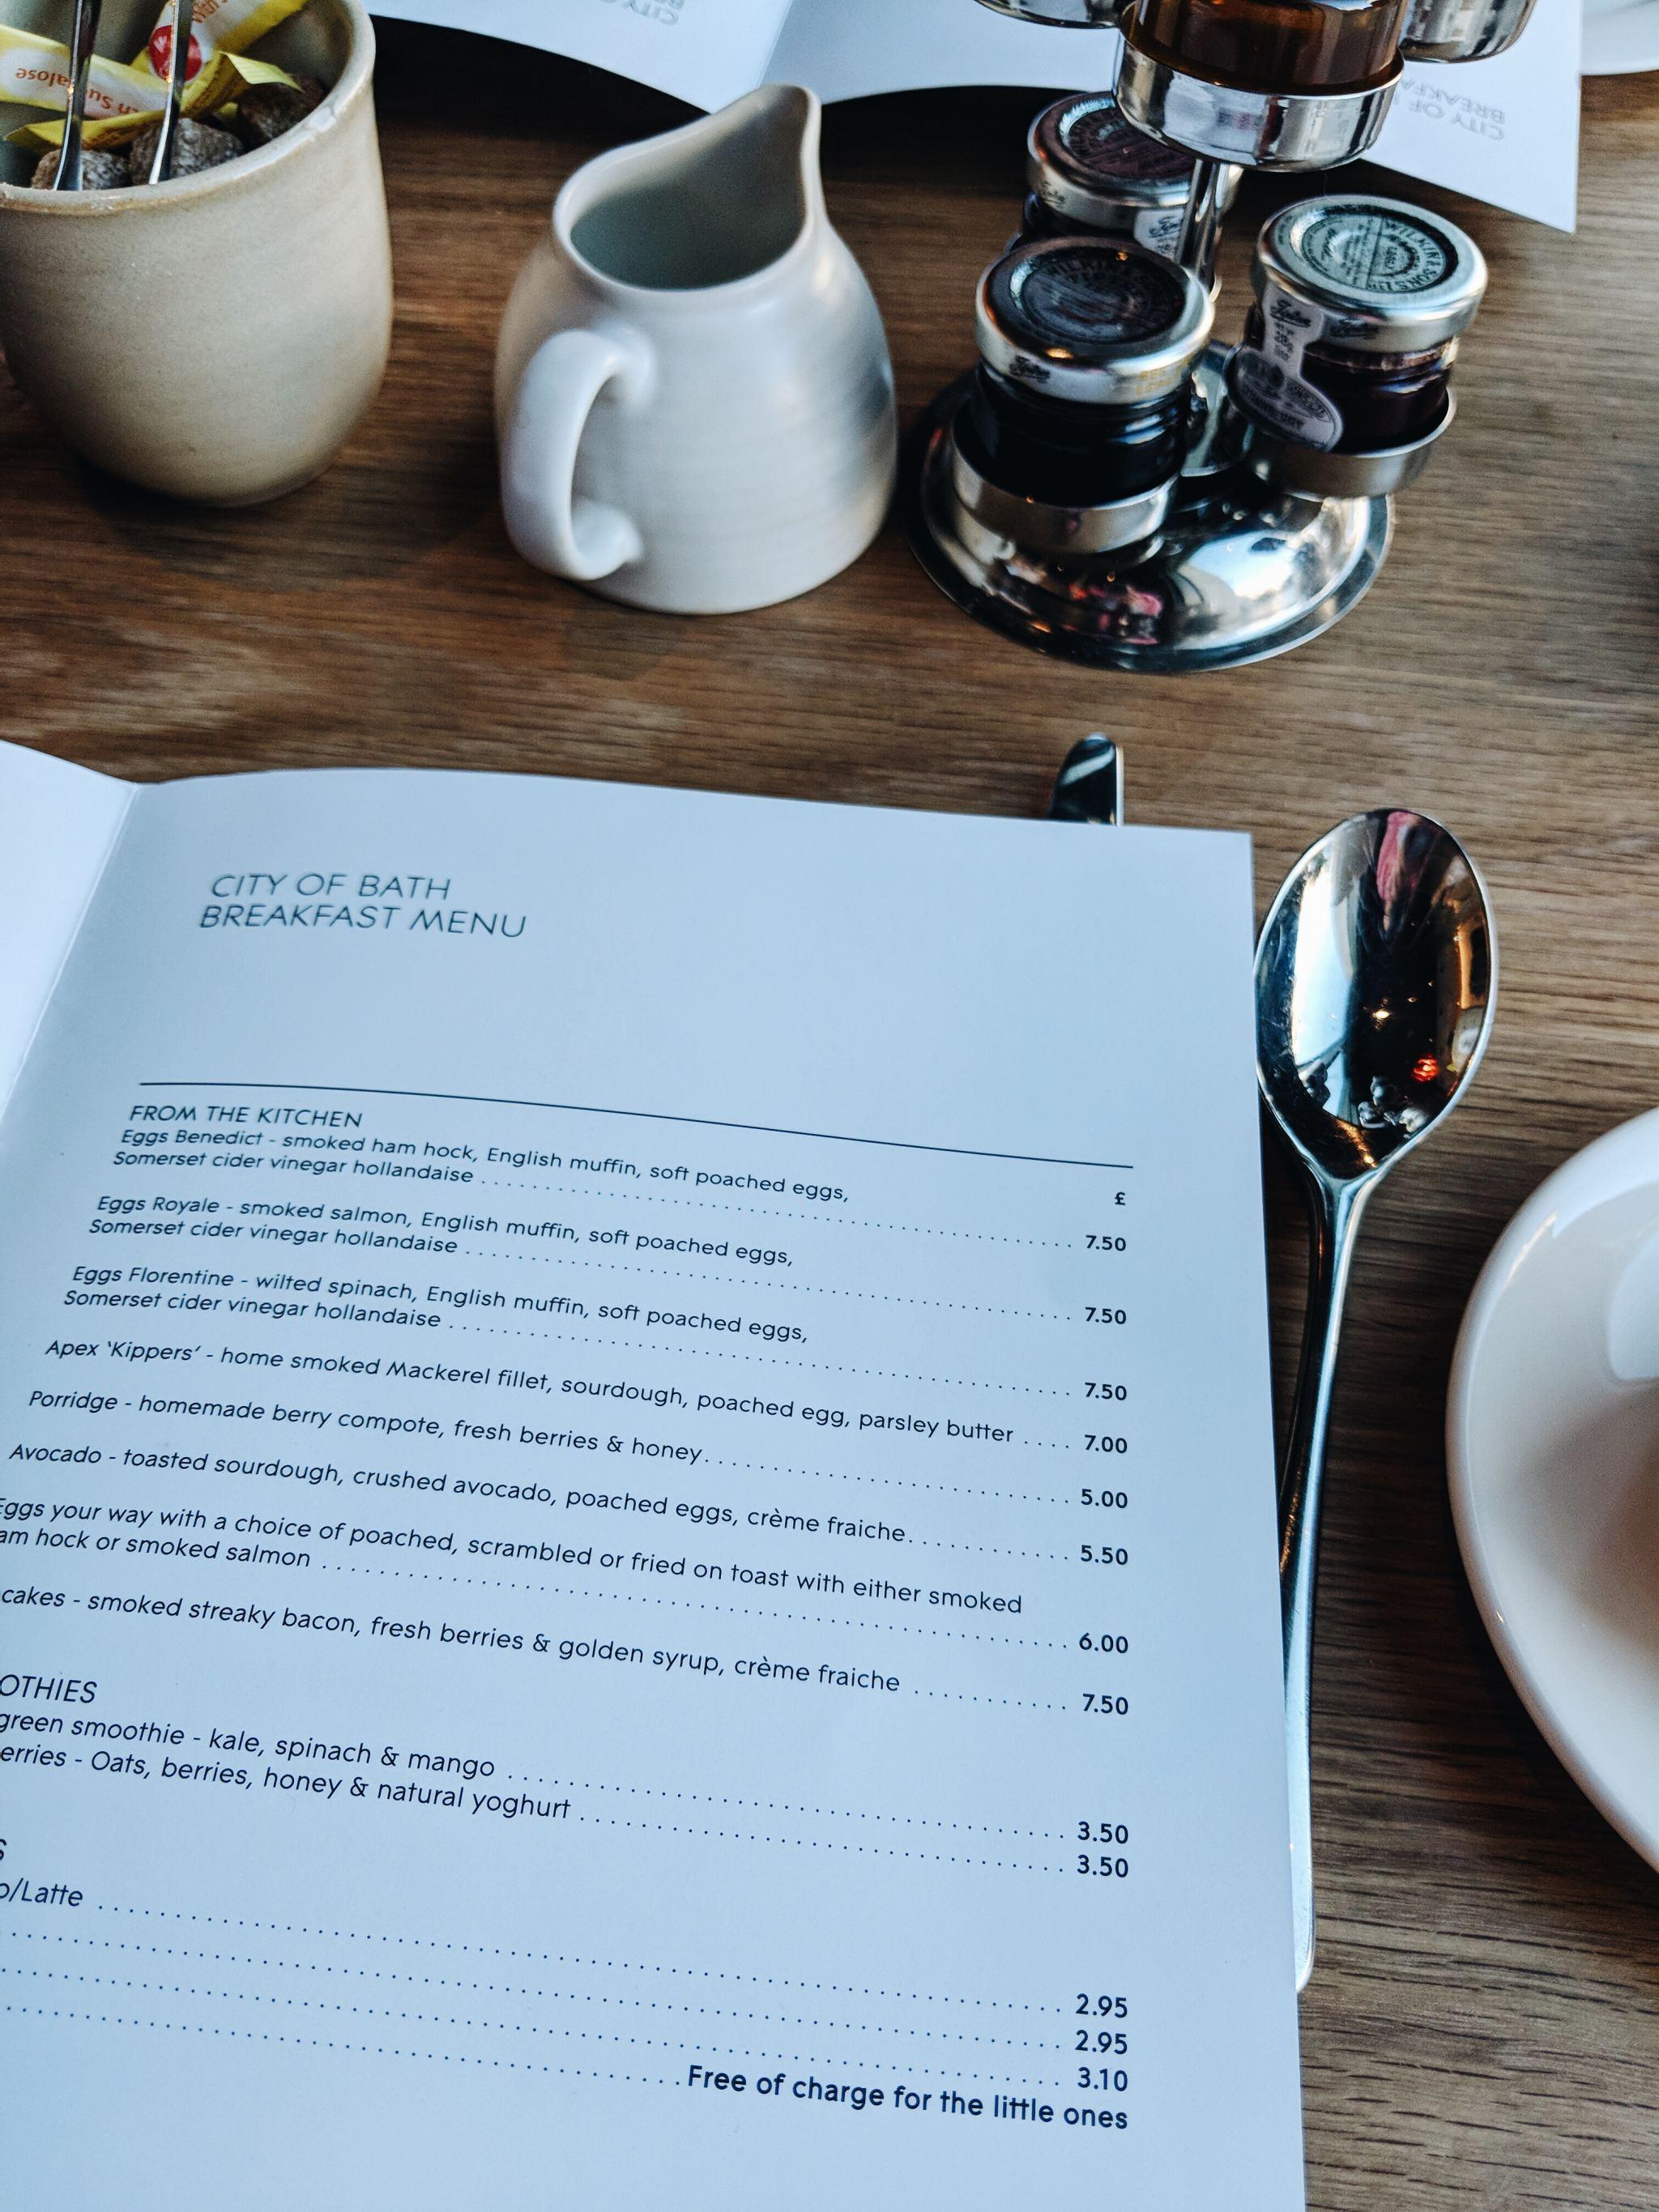 Cocoa Chelsea Apex Hotels City of Bath breakfast